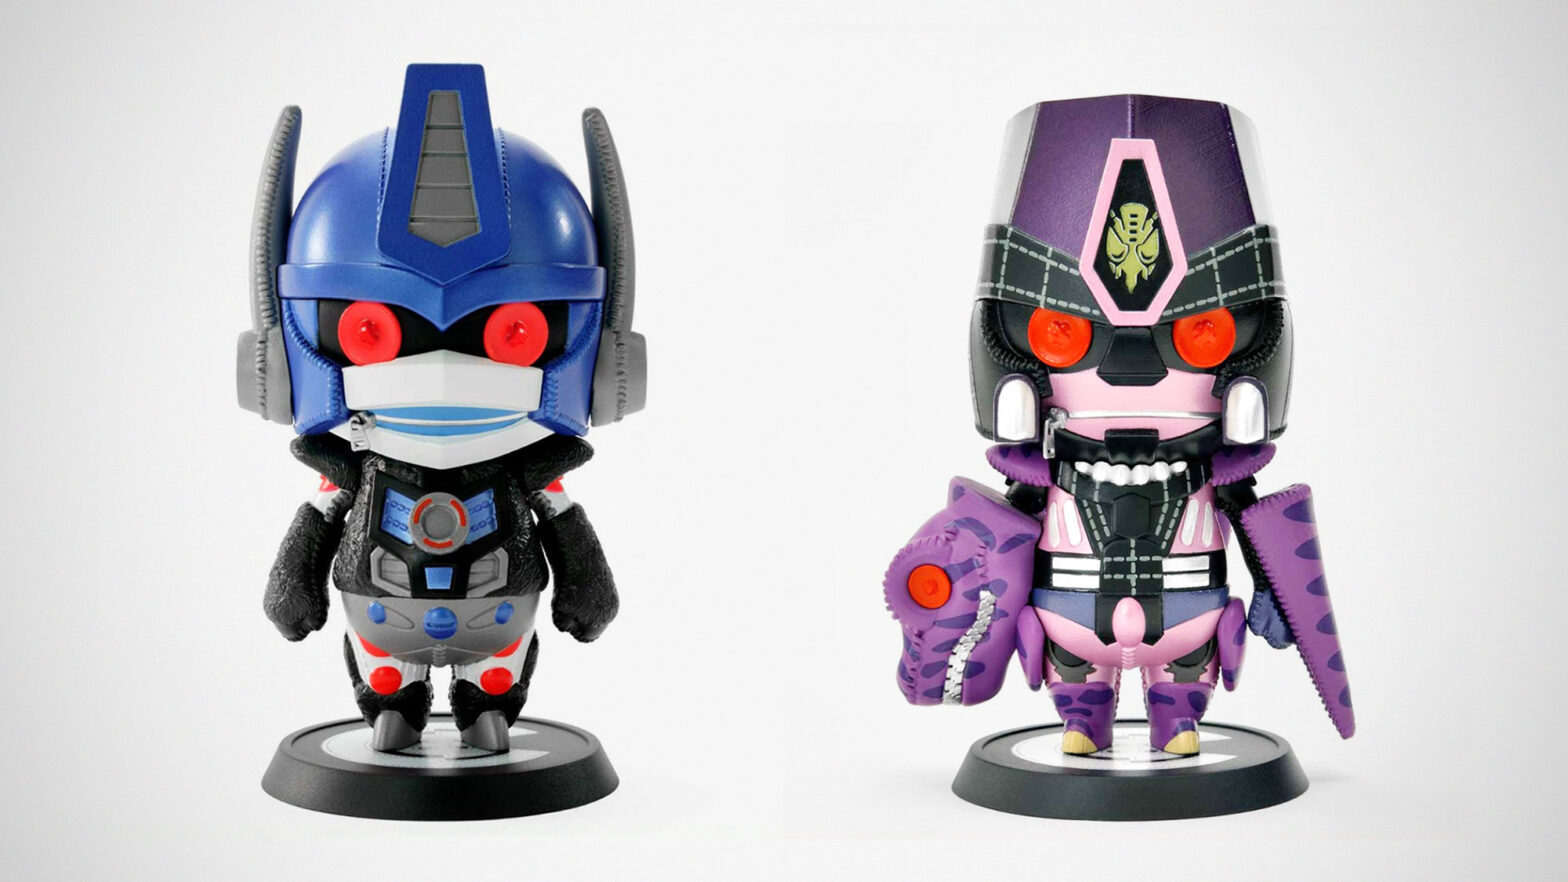 Cutie 1 Beast Wars Convoy and Megatron Figures